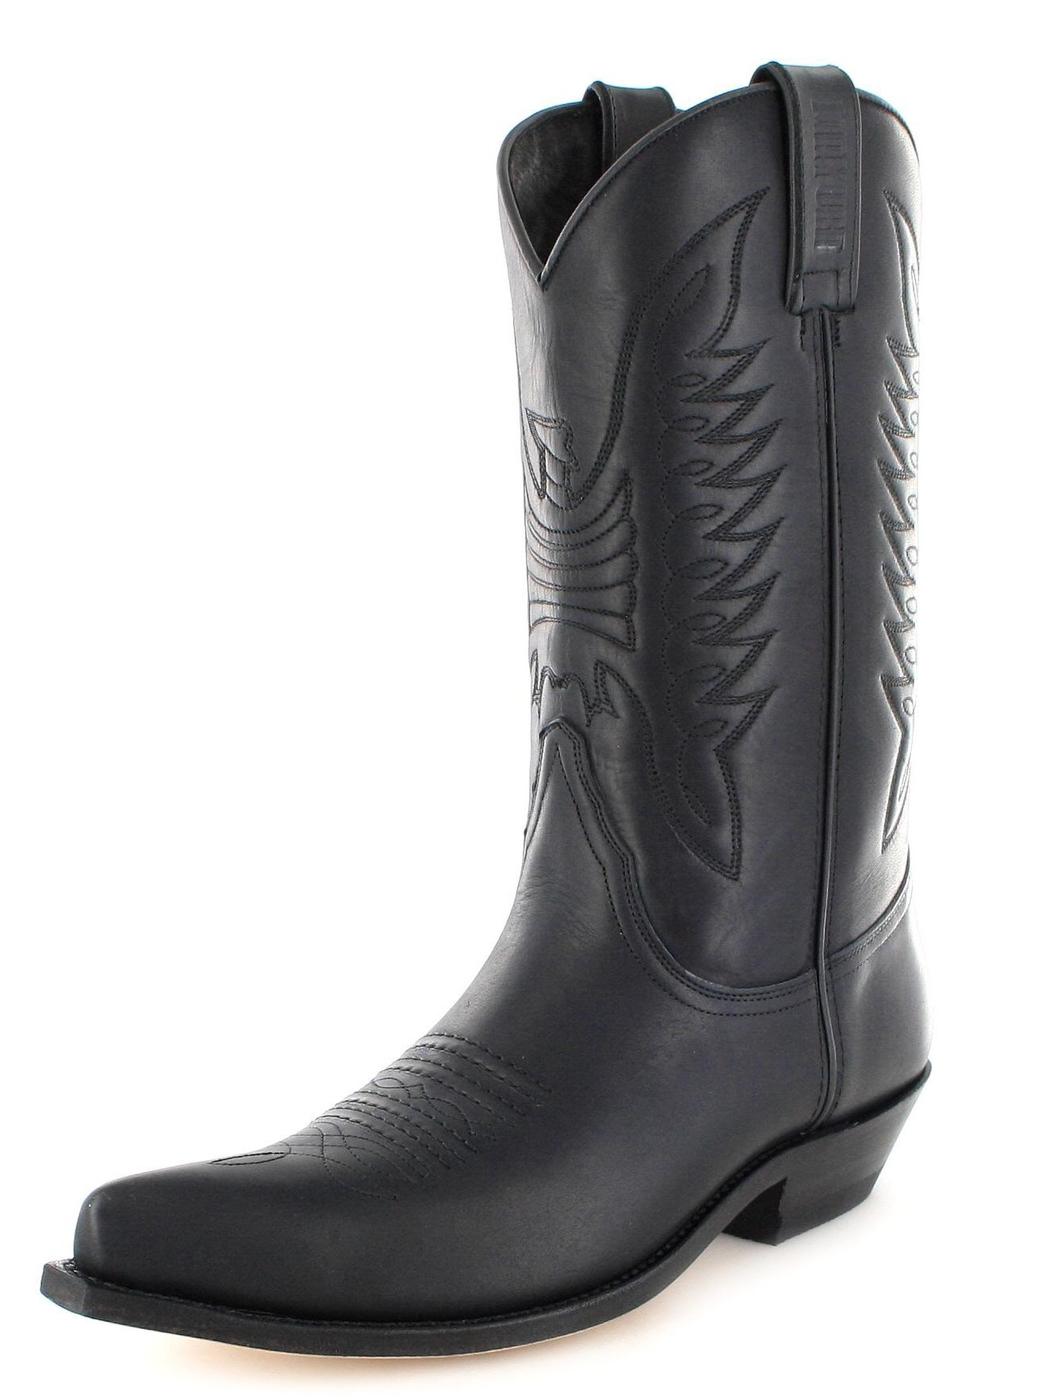 Mayura Boots MB020 Negro Western boot - black